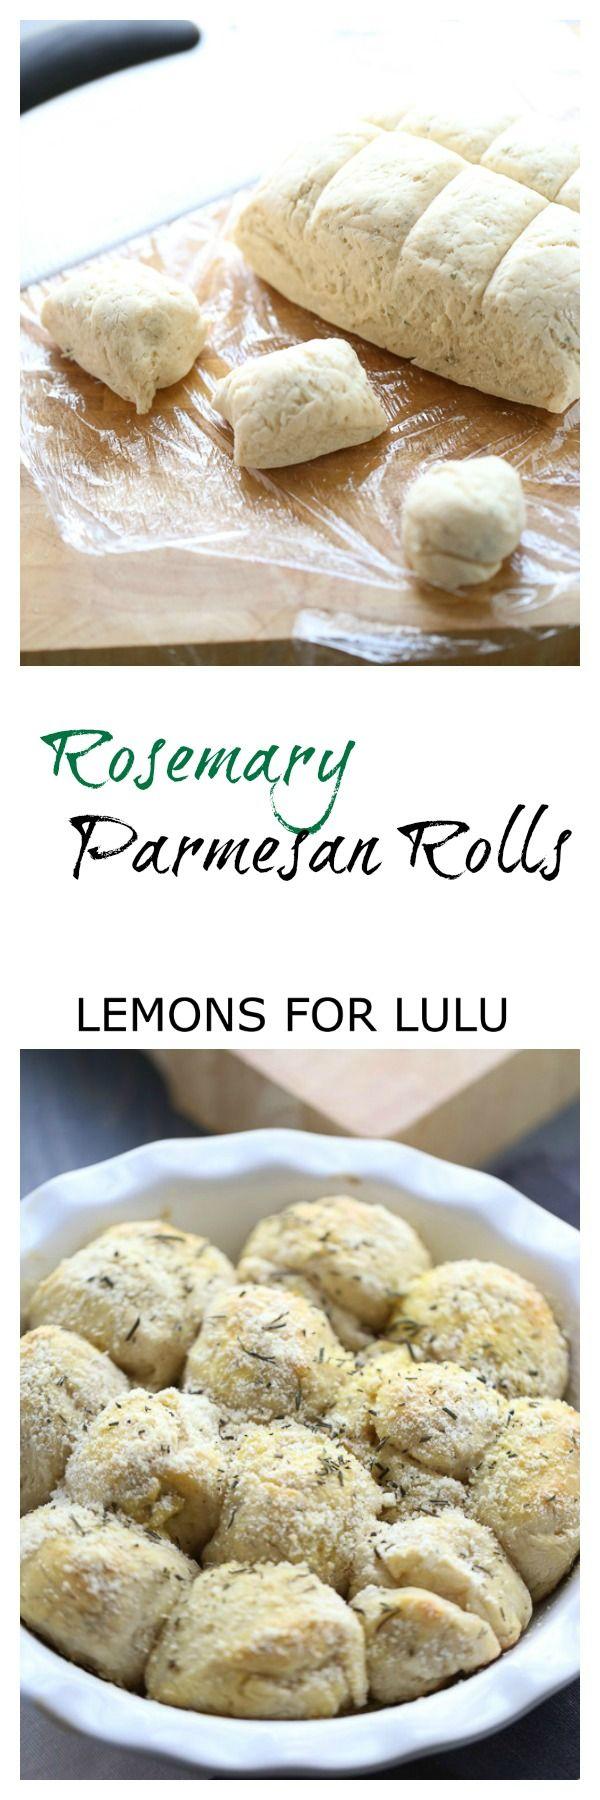 Rosemary Parmesan Potato Rolls ~ http://www.lemonsforlulu.com